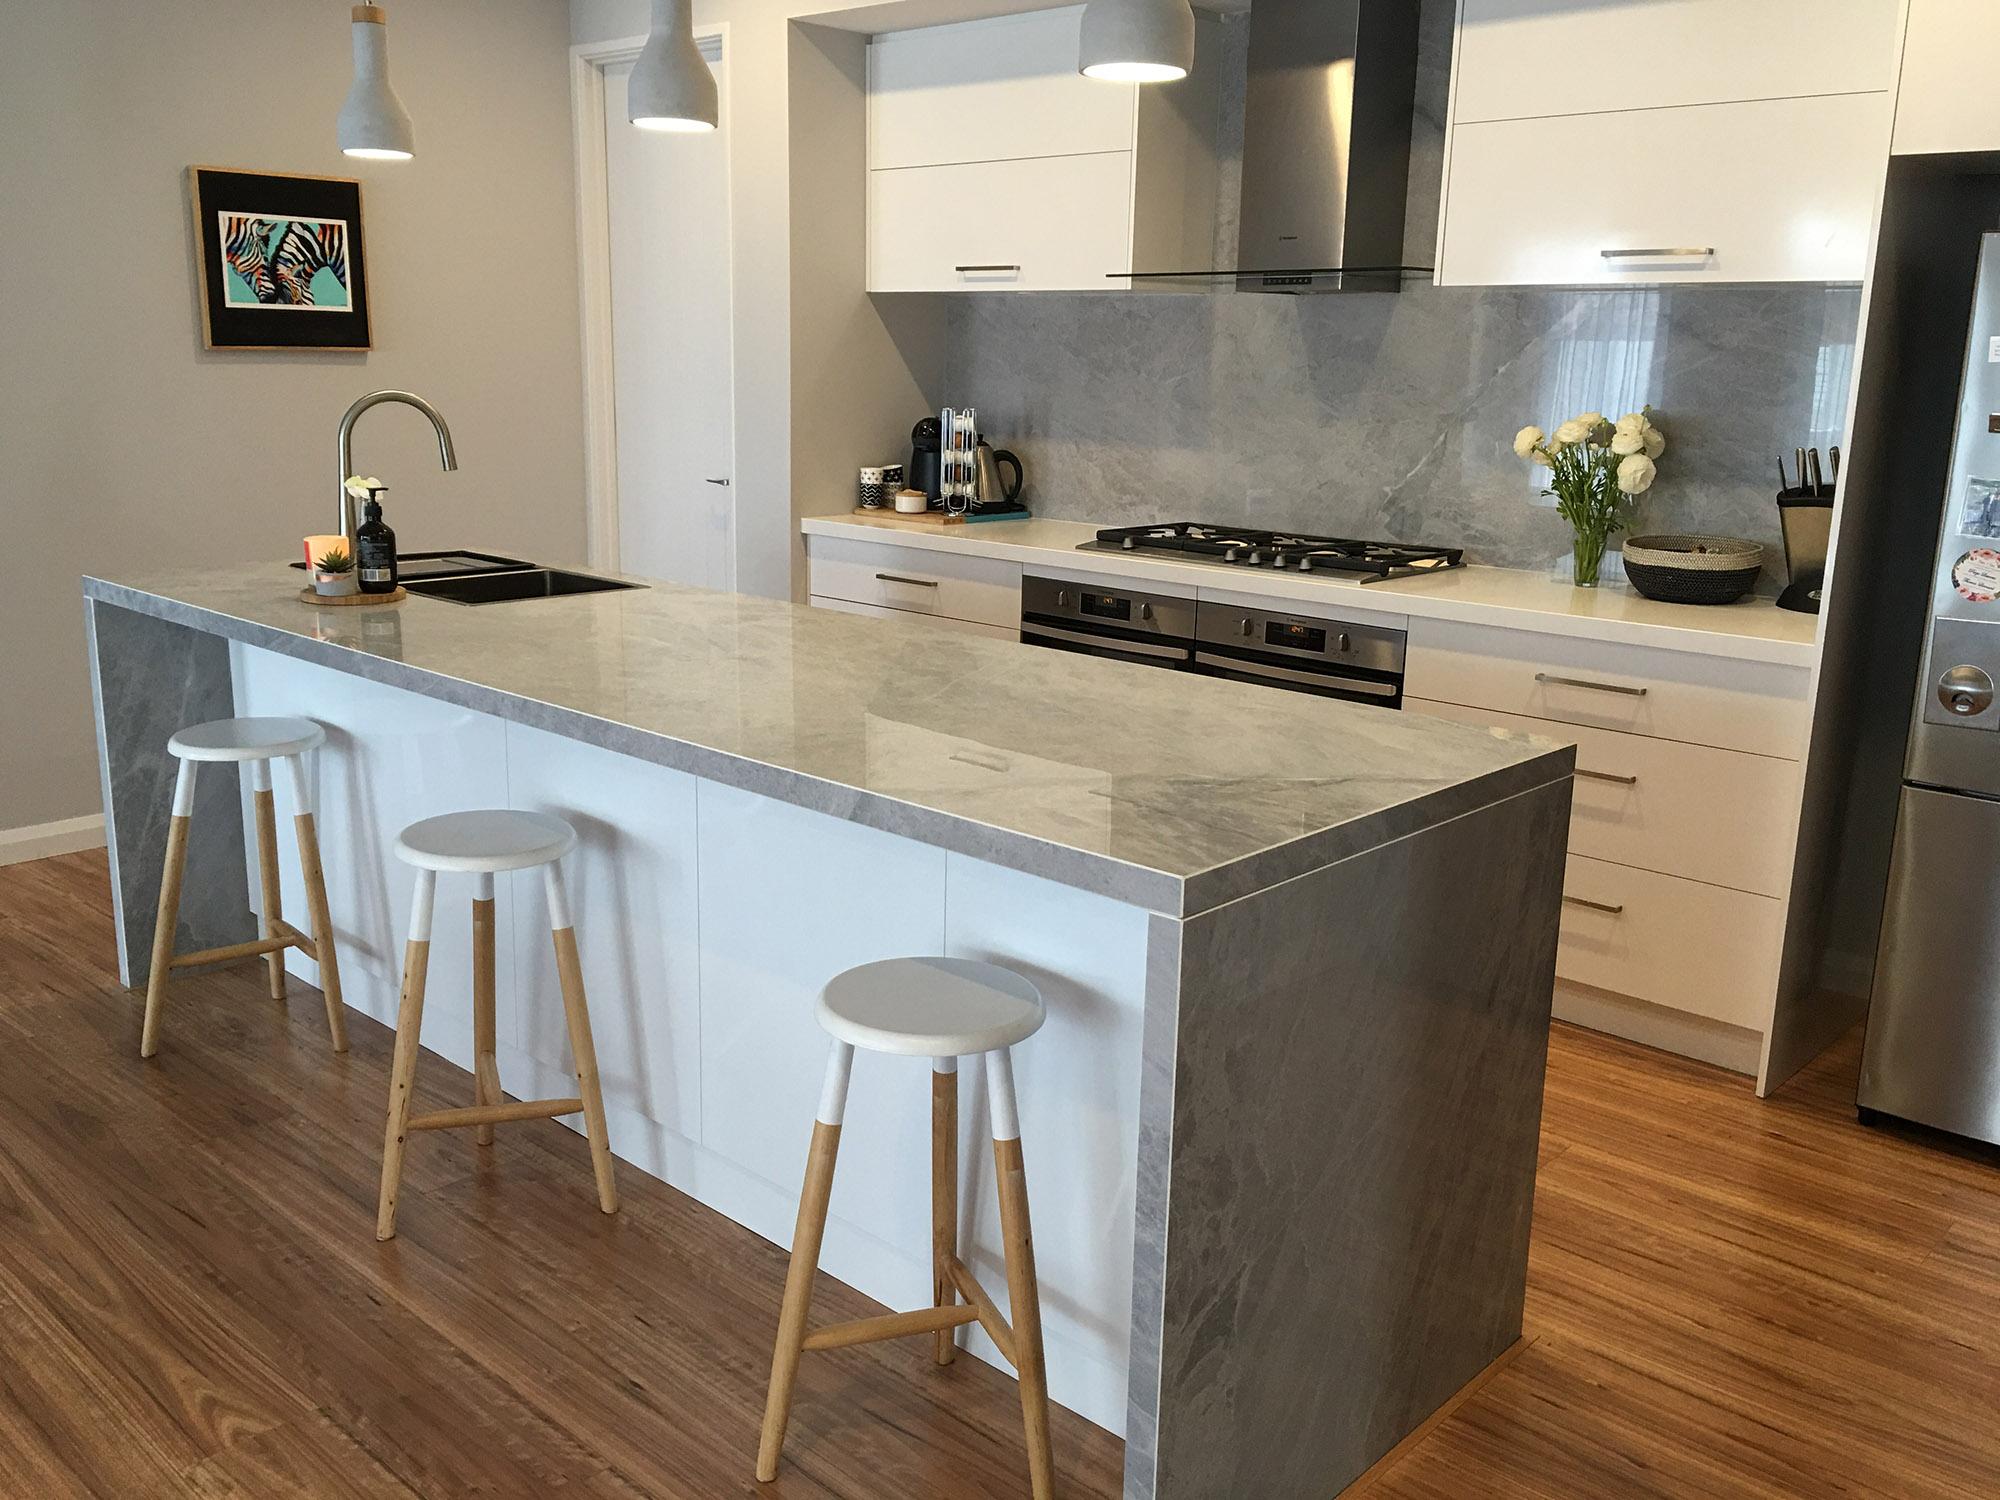 bravvo porcelain stone kitchen benchtop